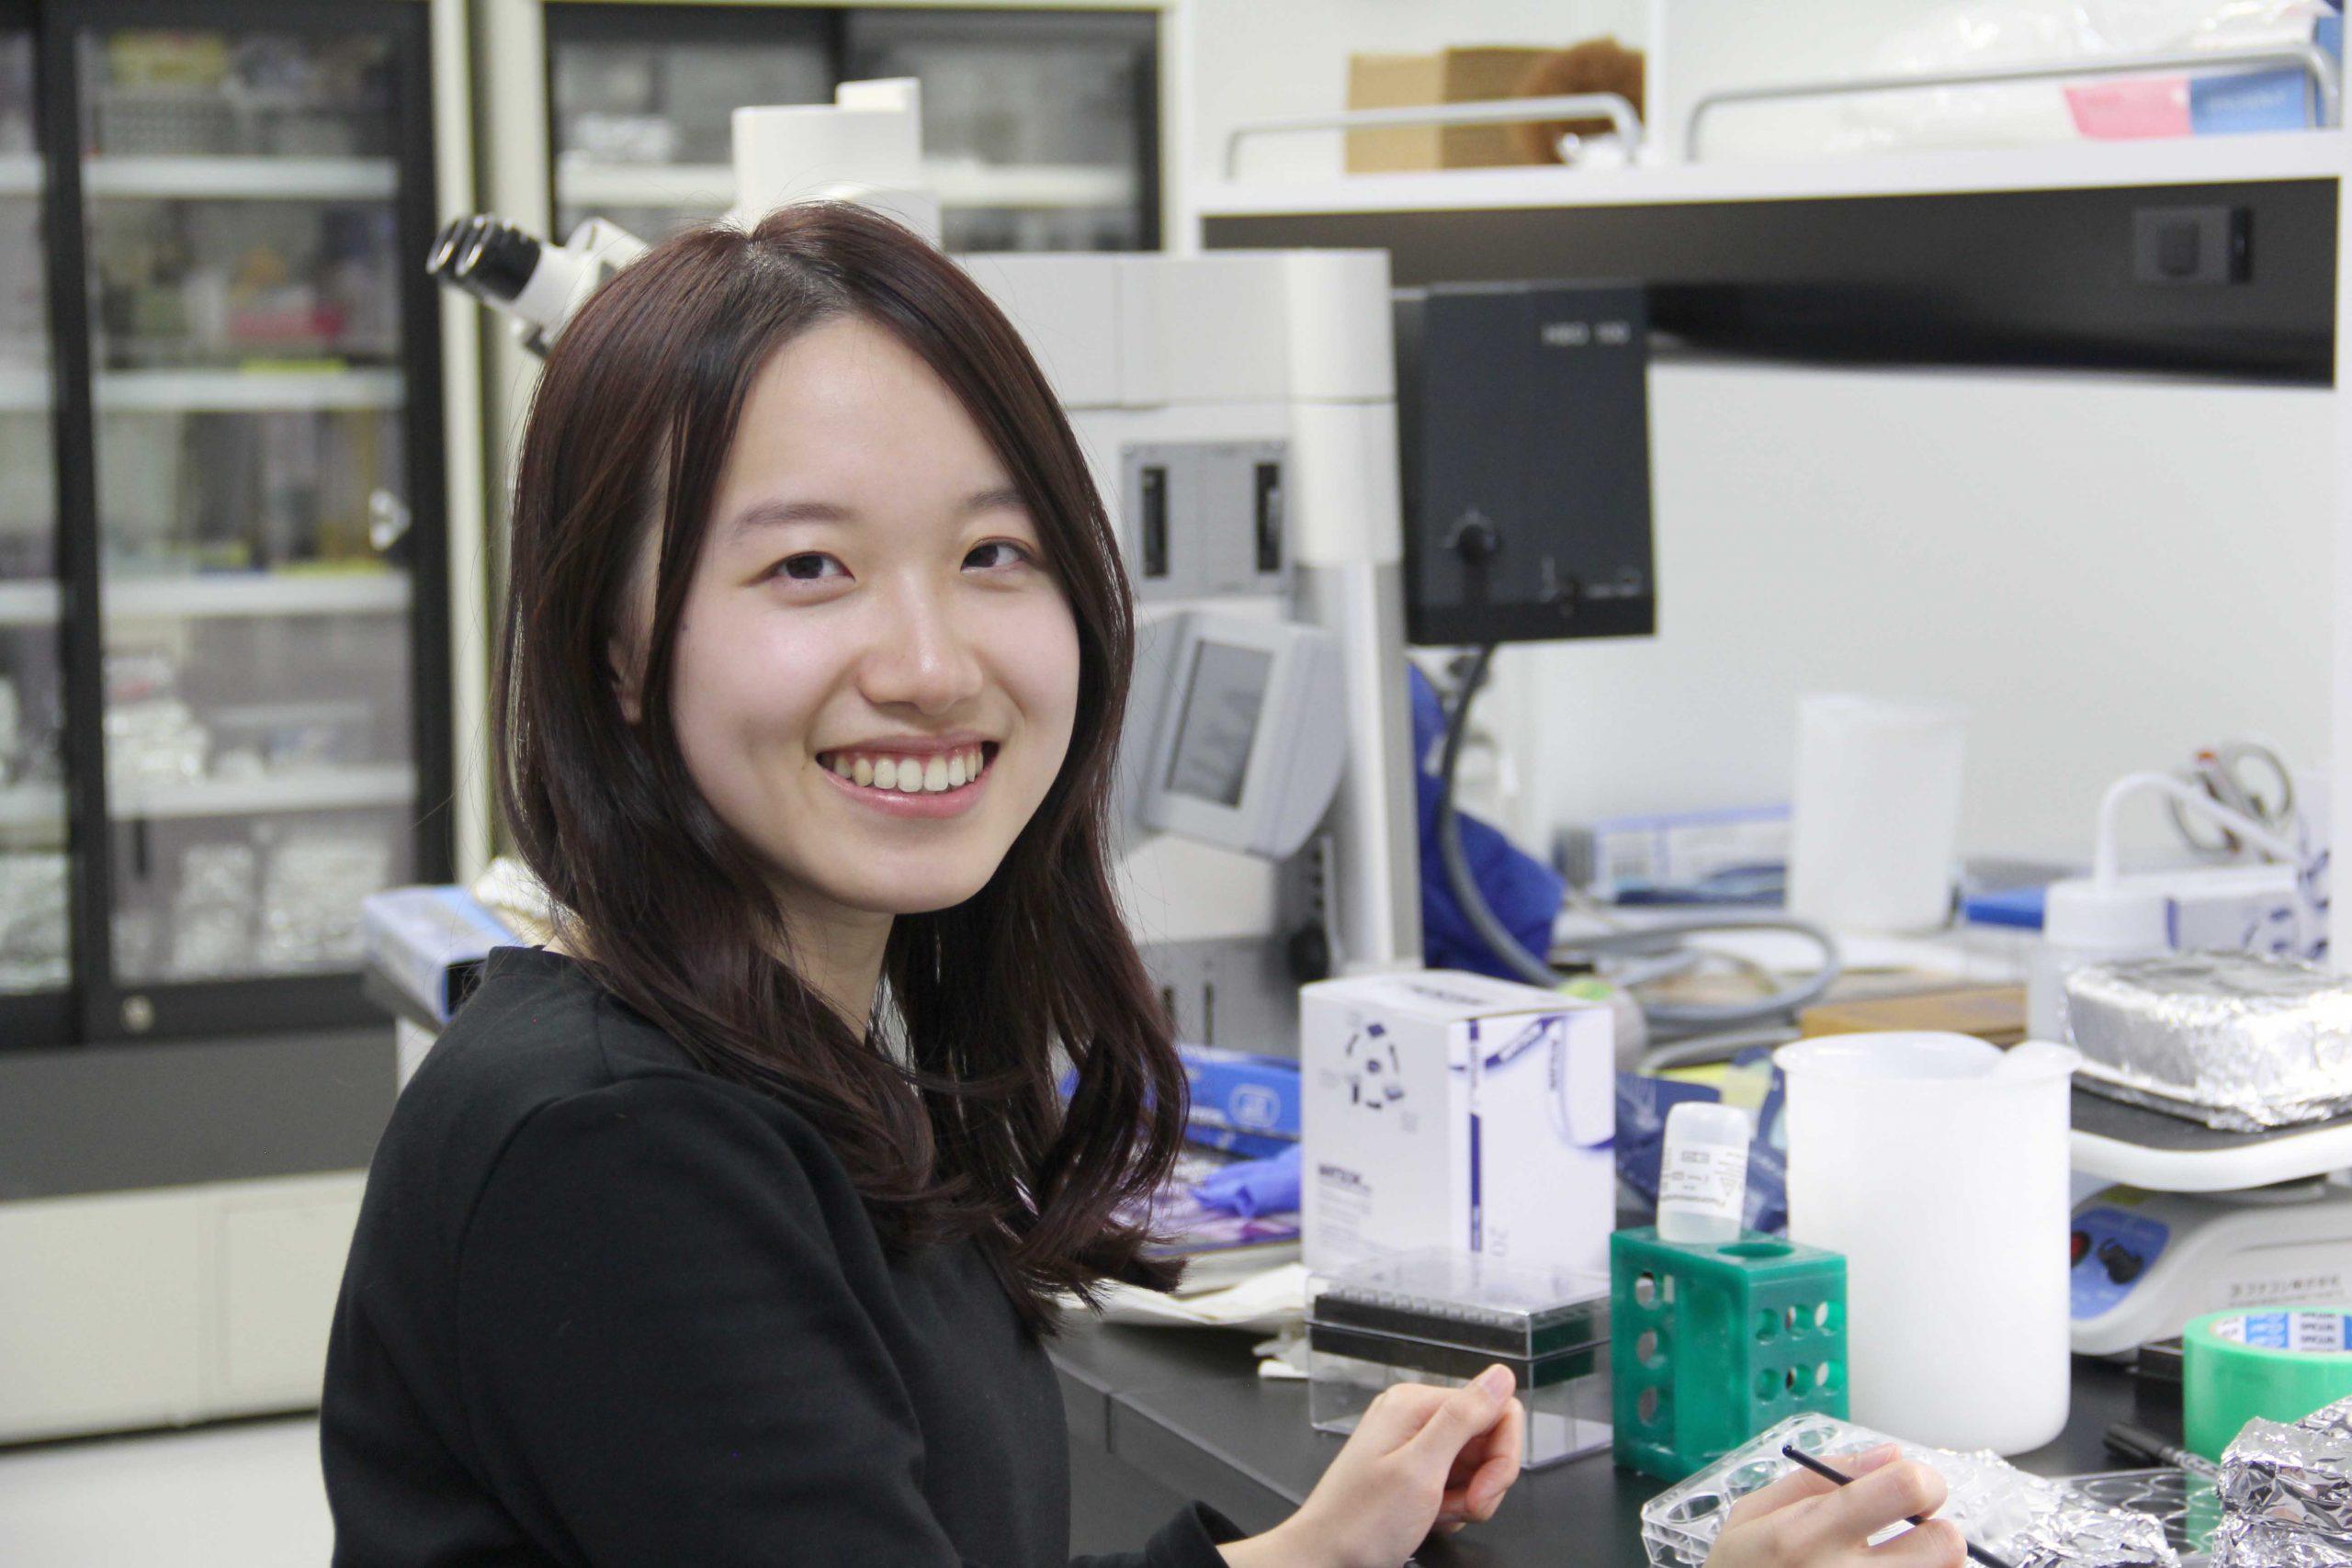 Ziyan Huang